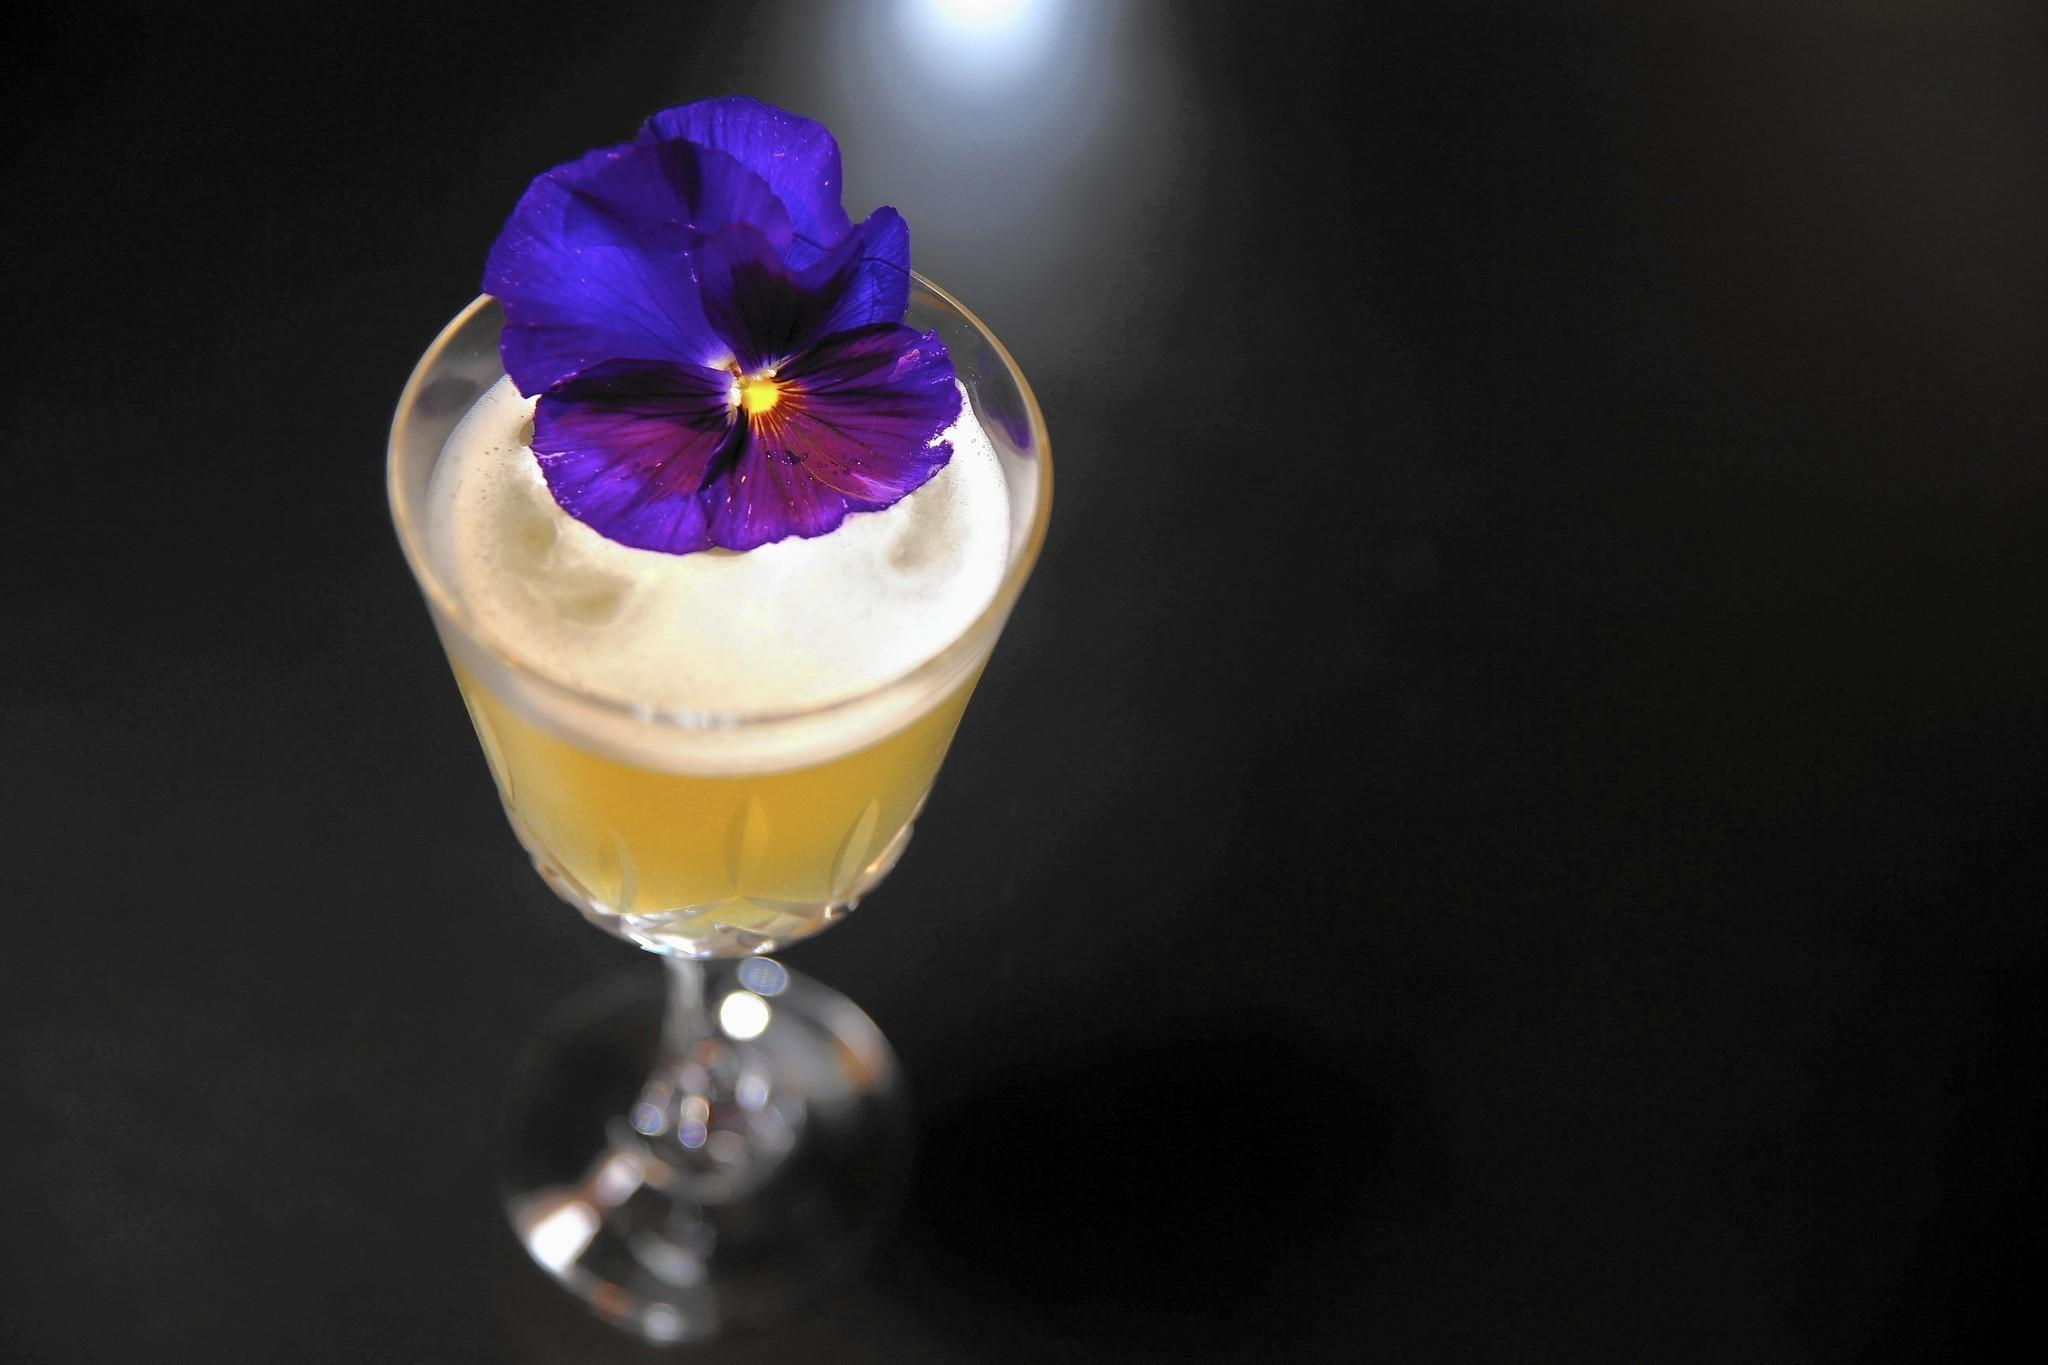 Floral cocktails spring up on cocktail menus chicago tribune izmirmasajfo